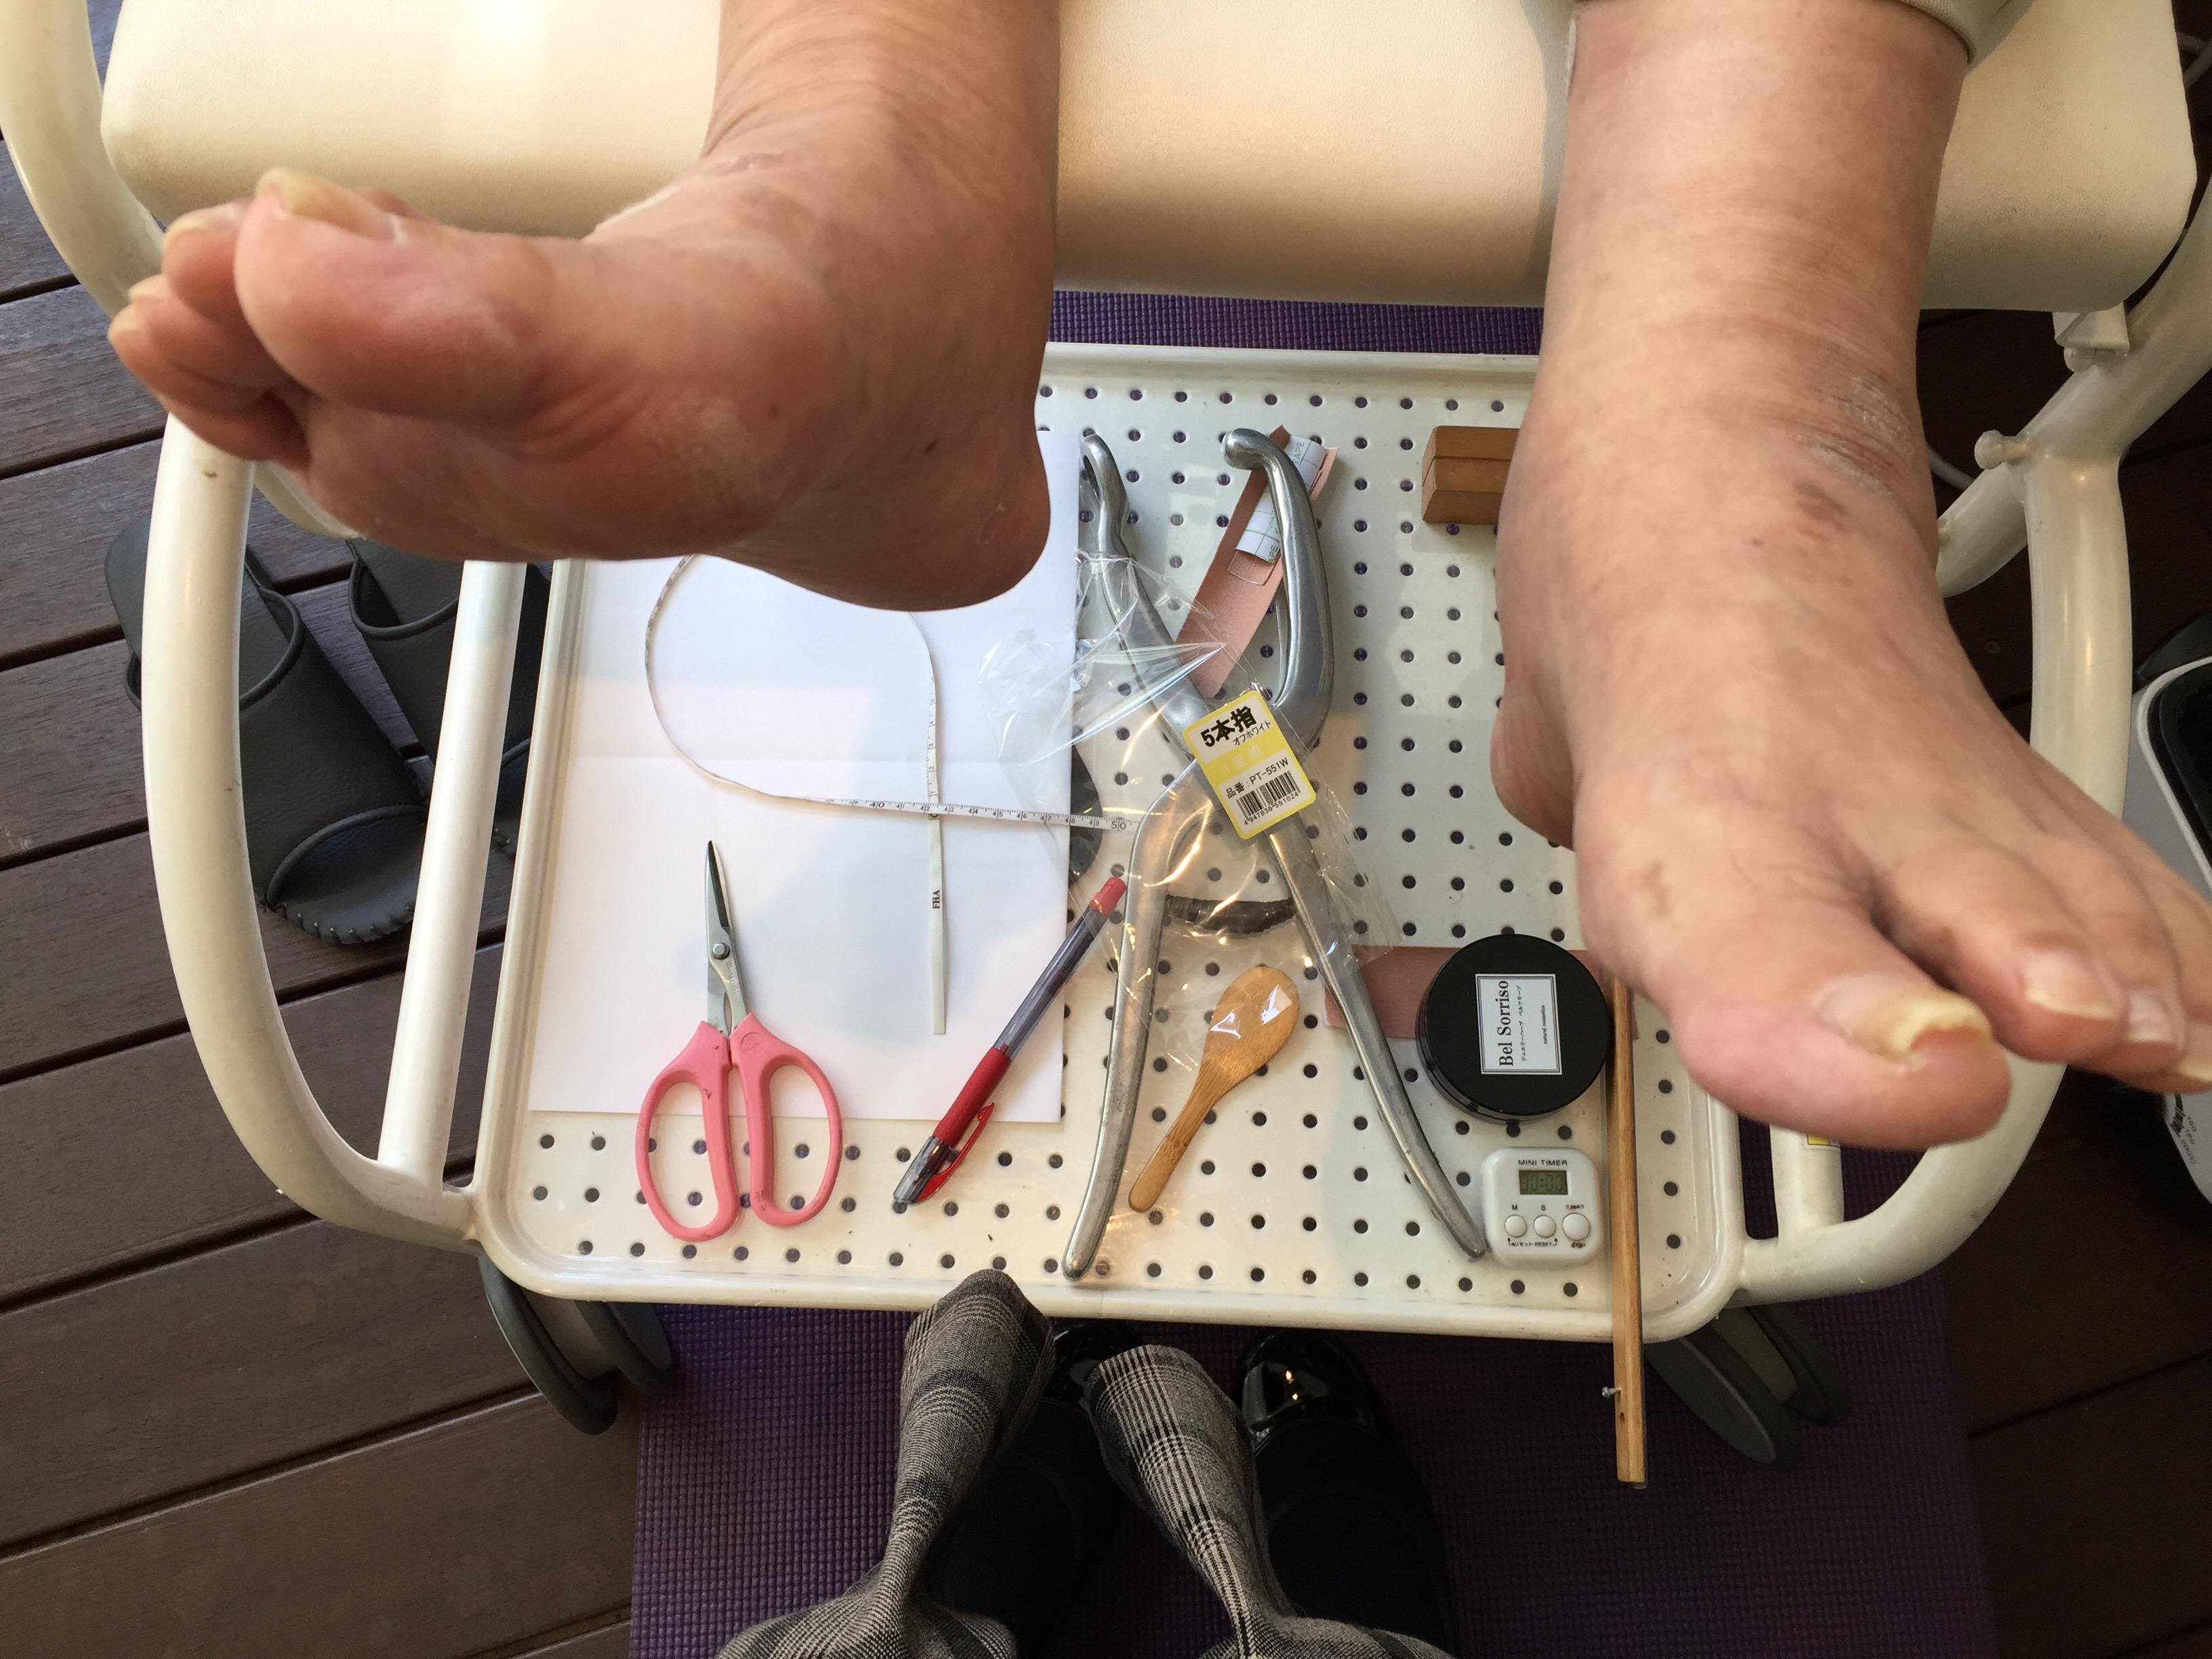 image-【脚の長さが左右で違う時の対処法】 | オーダーインソールのクイスクイス